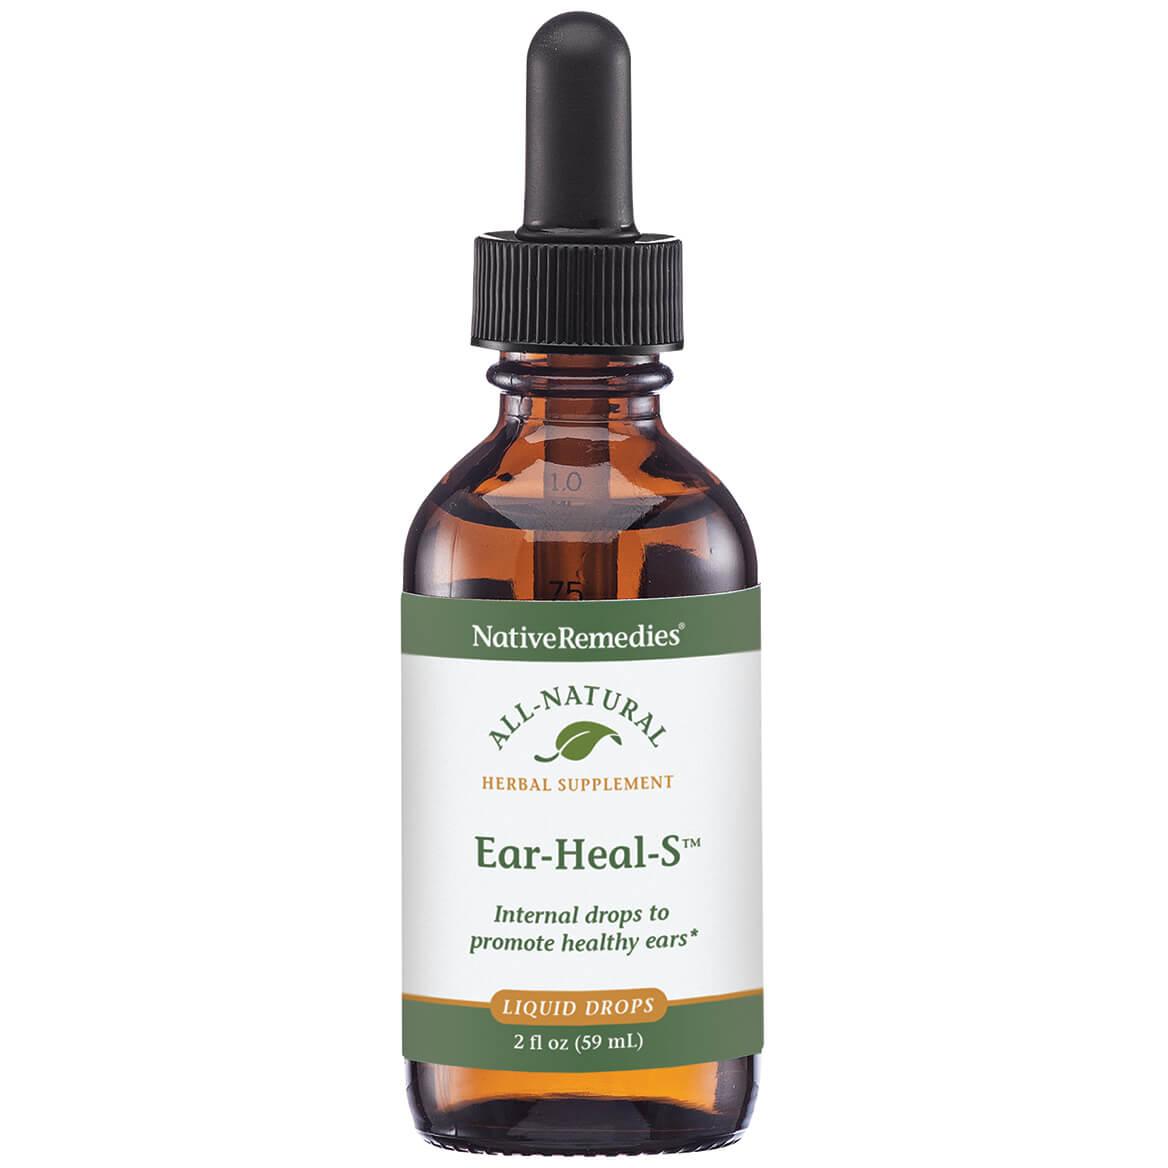 Ear-Heal-S™ for Ear Health Support-351878